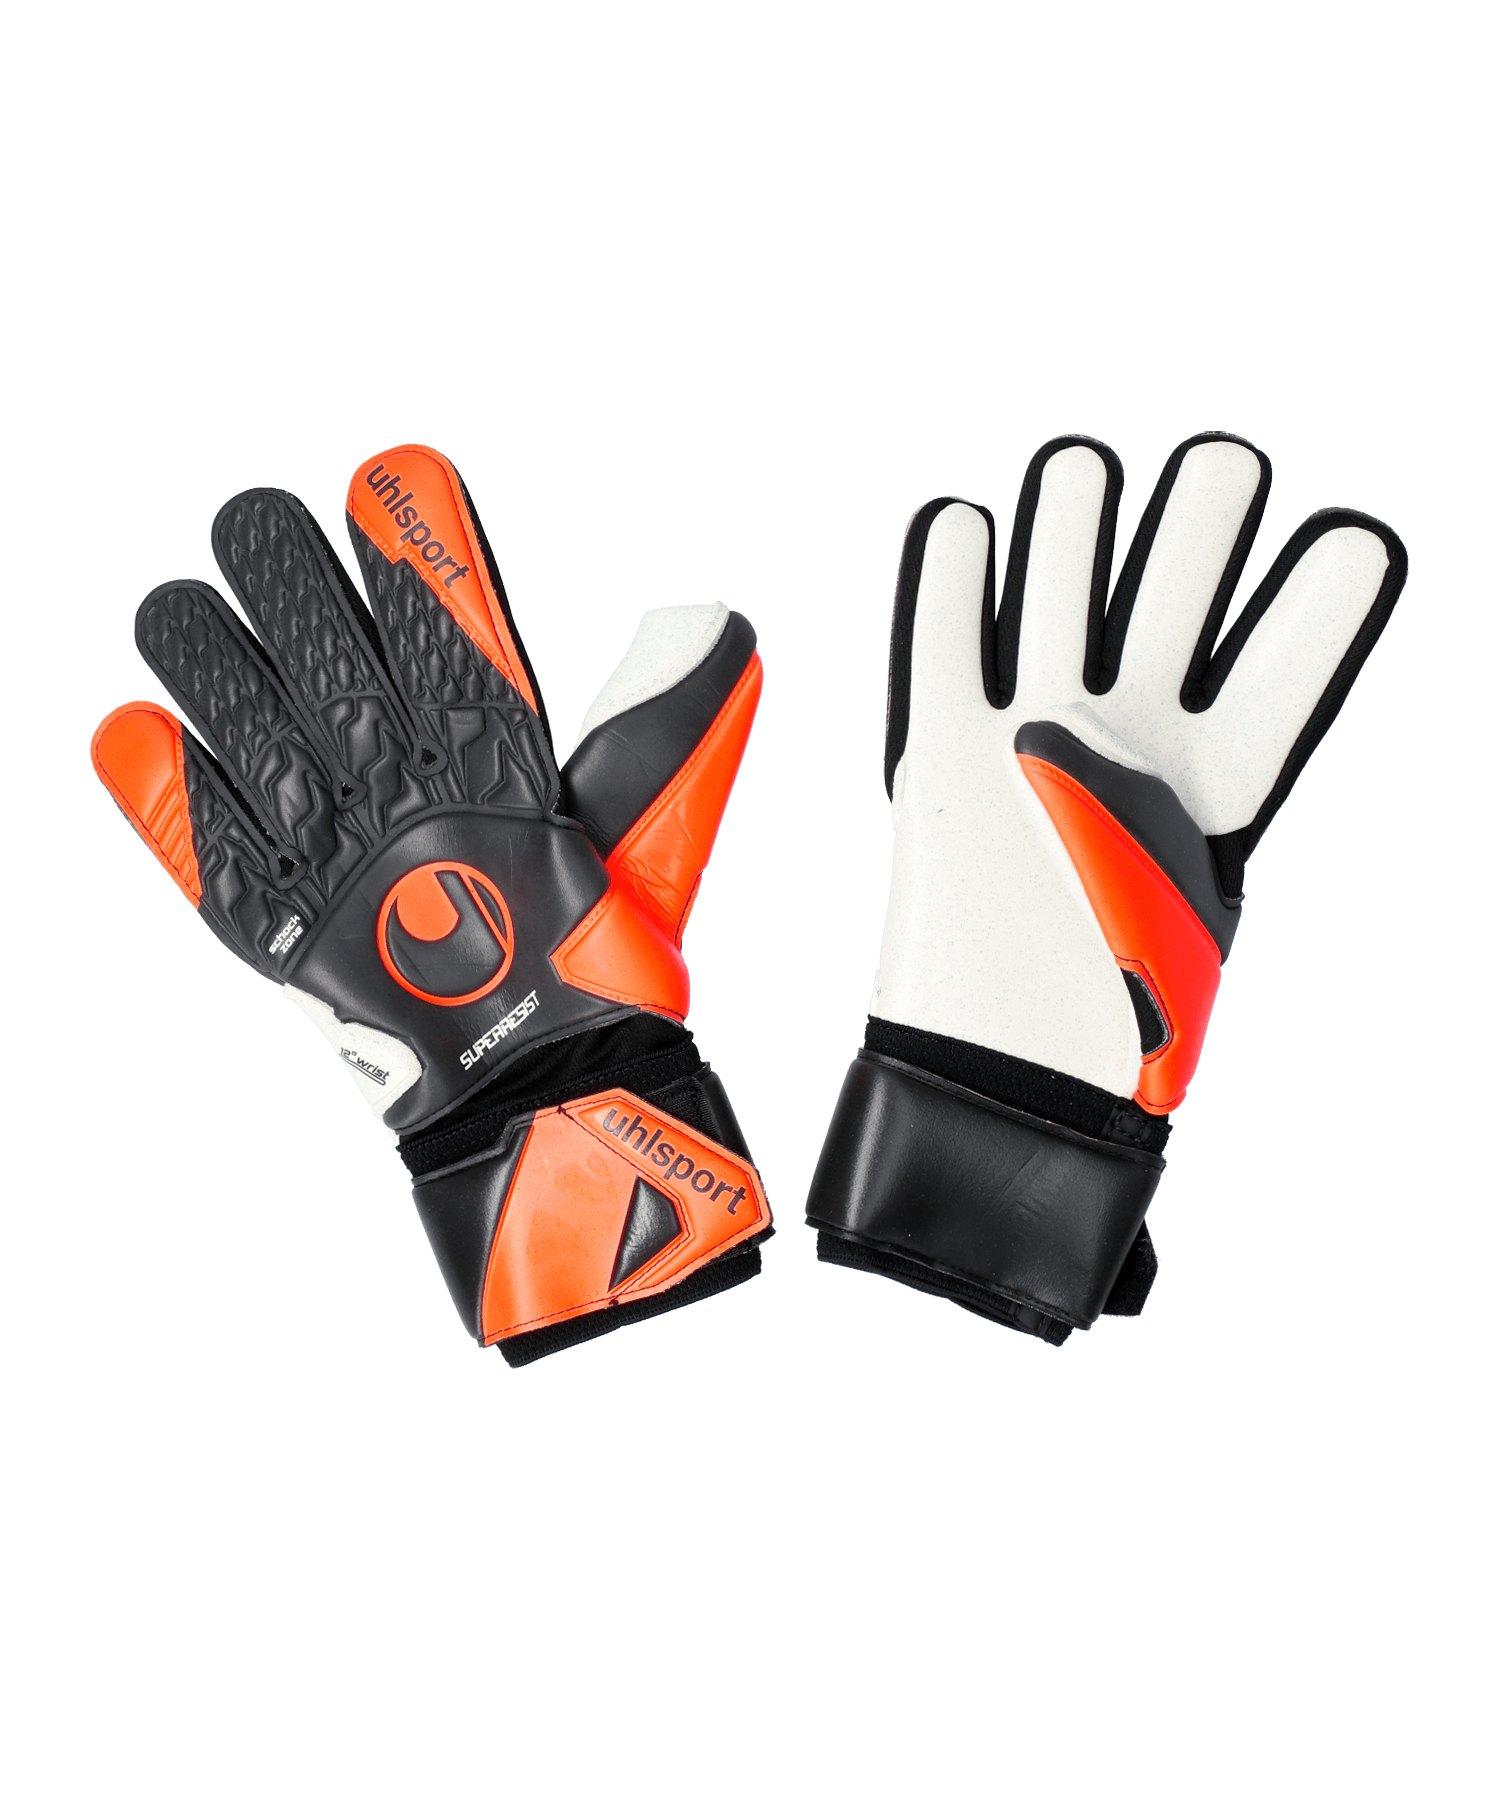 Uhlsport Super Resist HN TW-Handschuh F01 - schwarz